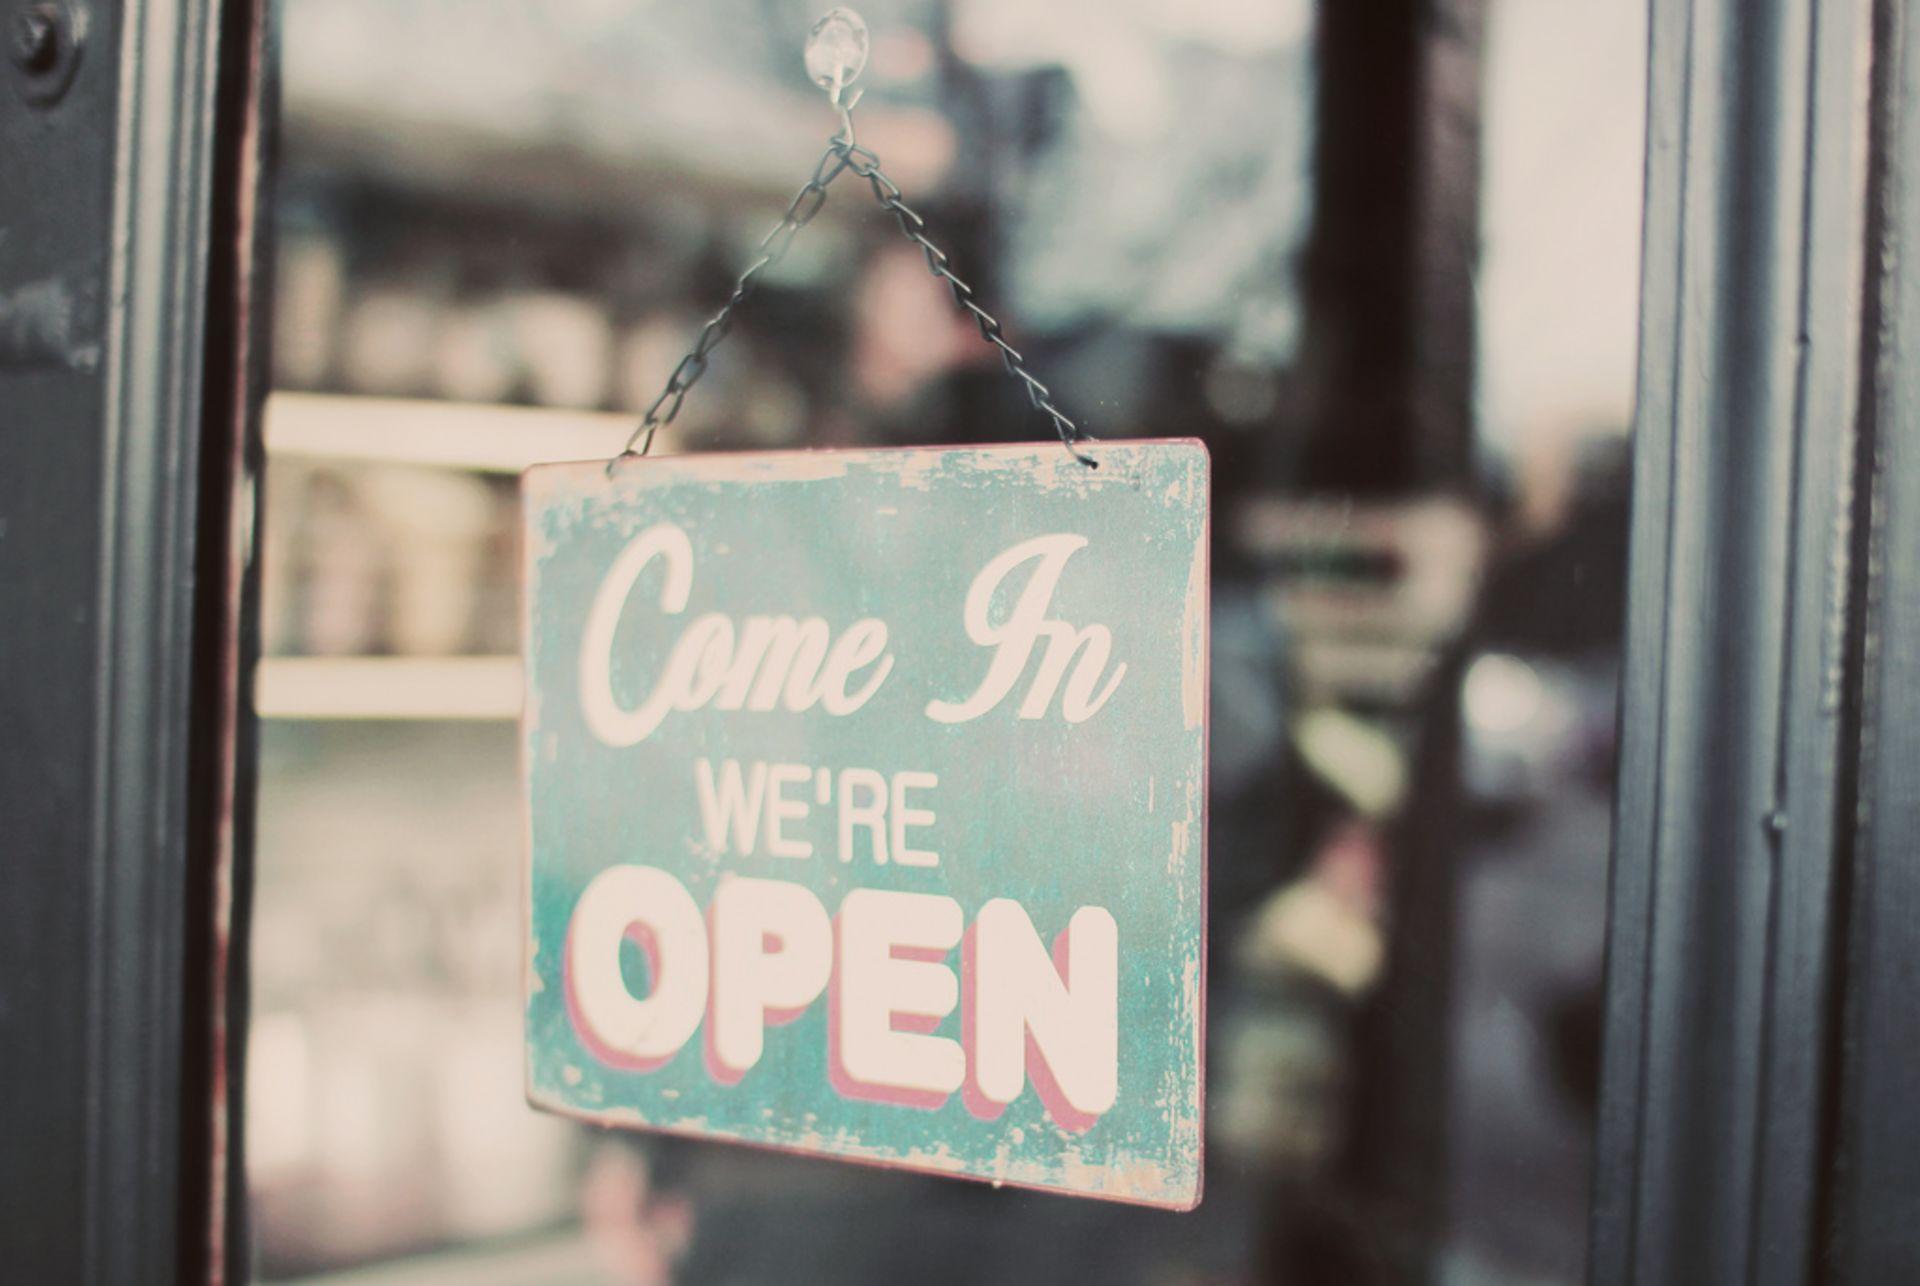 Miami's small business economy ranks No. 10 in nation